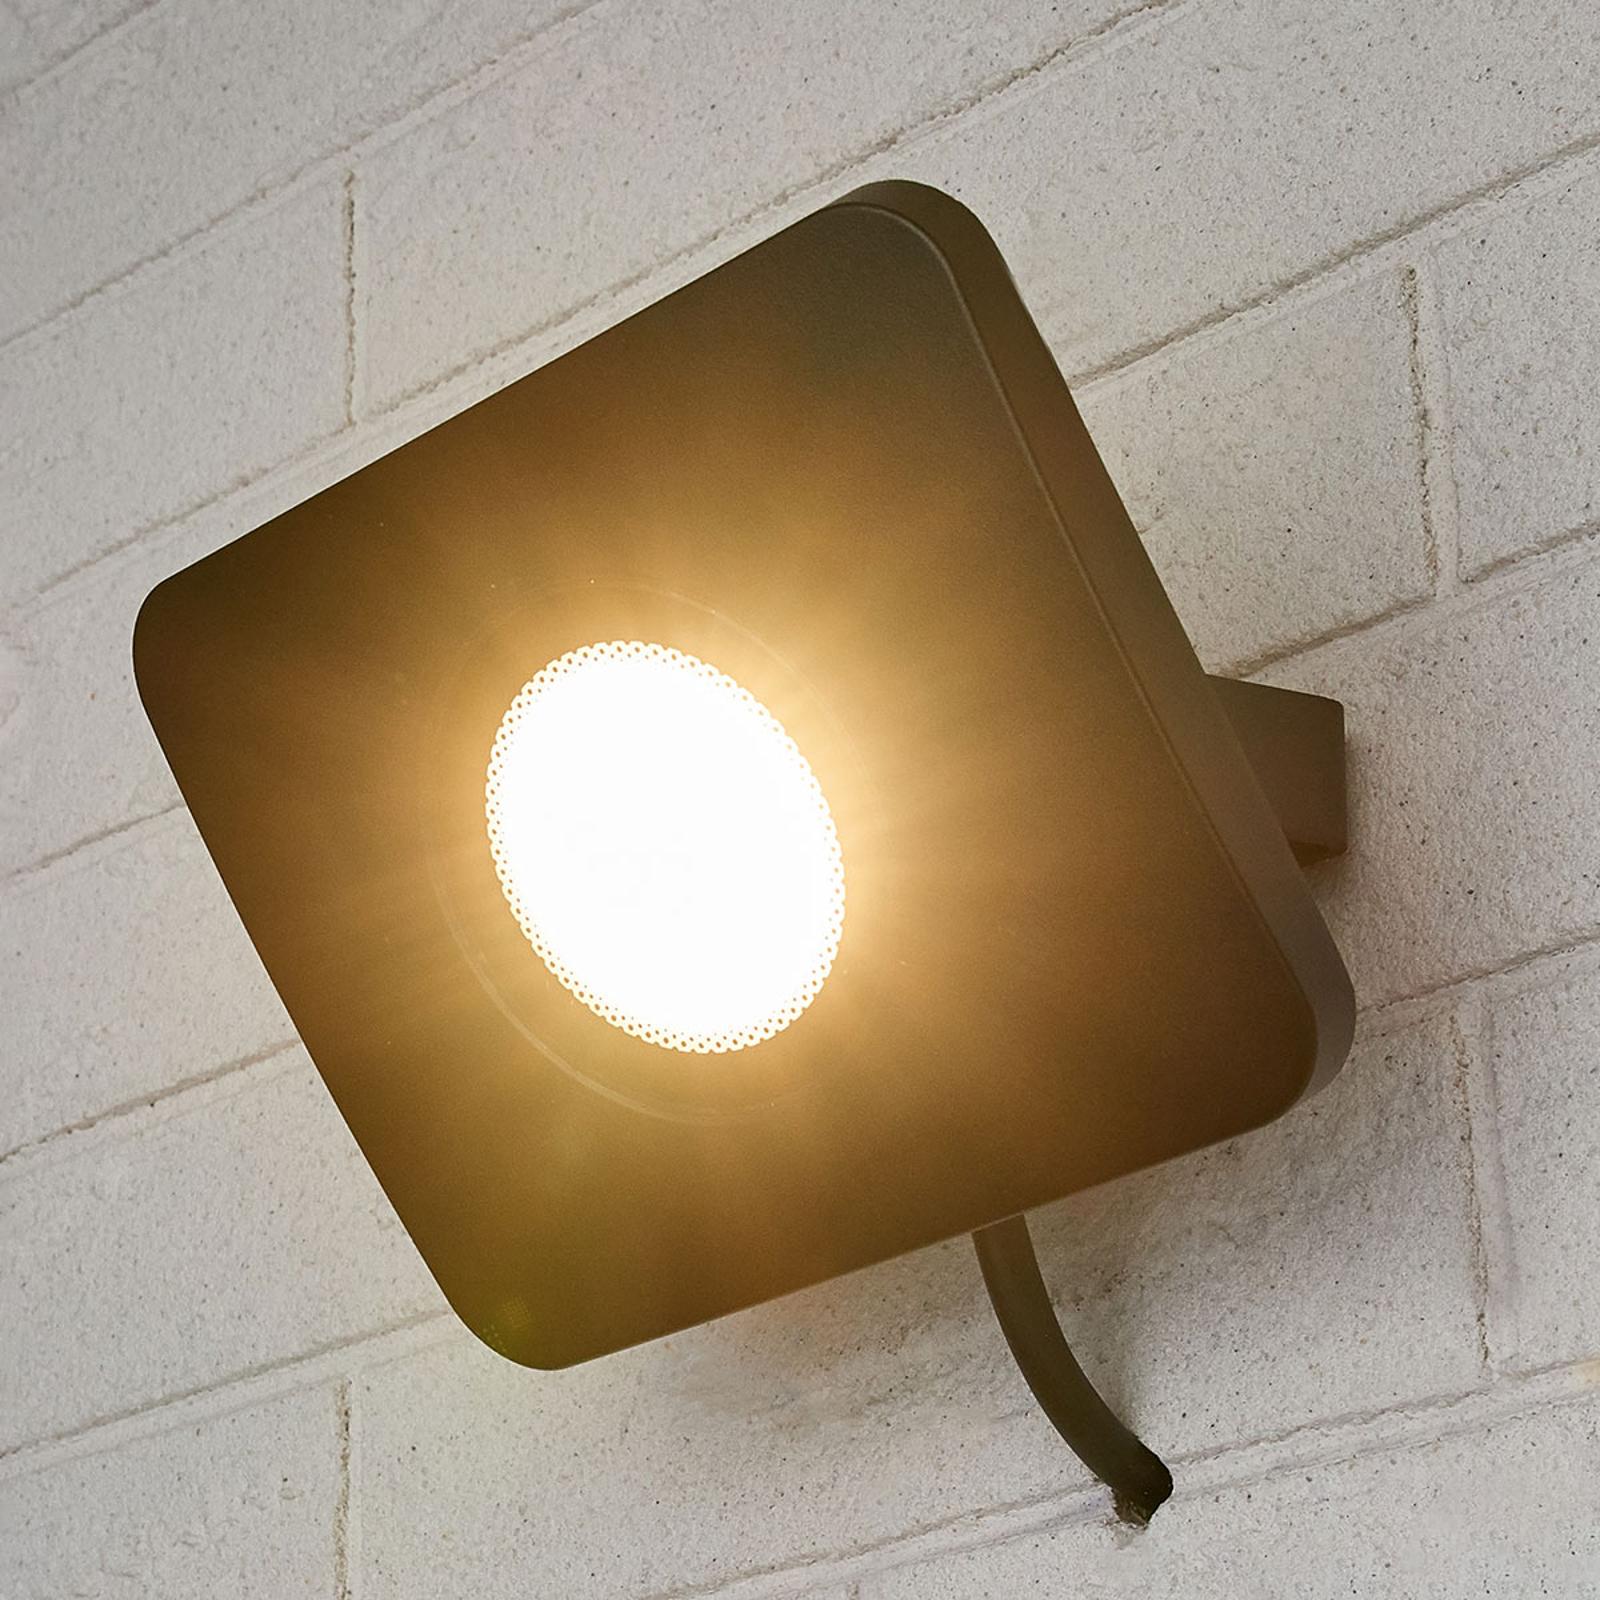 LED-Außenwandstrahler Duke aus Aluminium, 30W